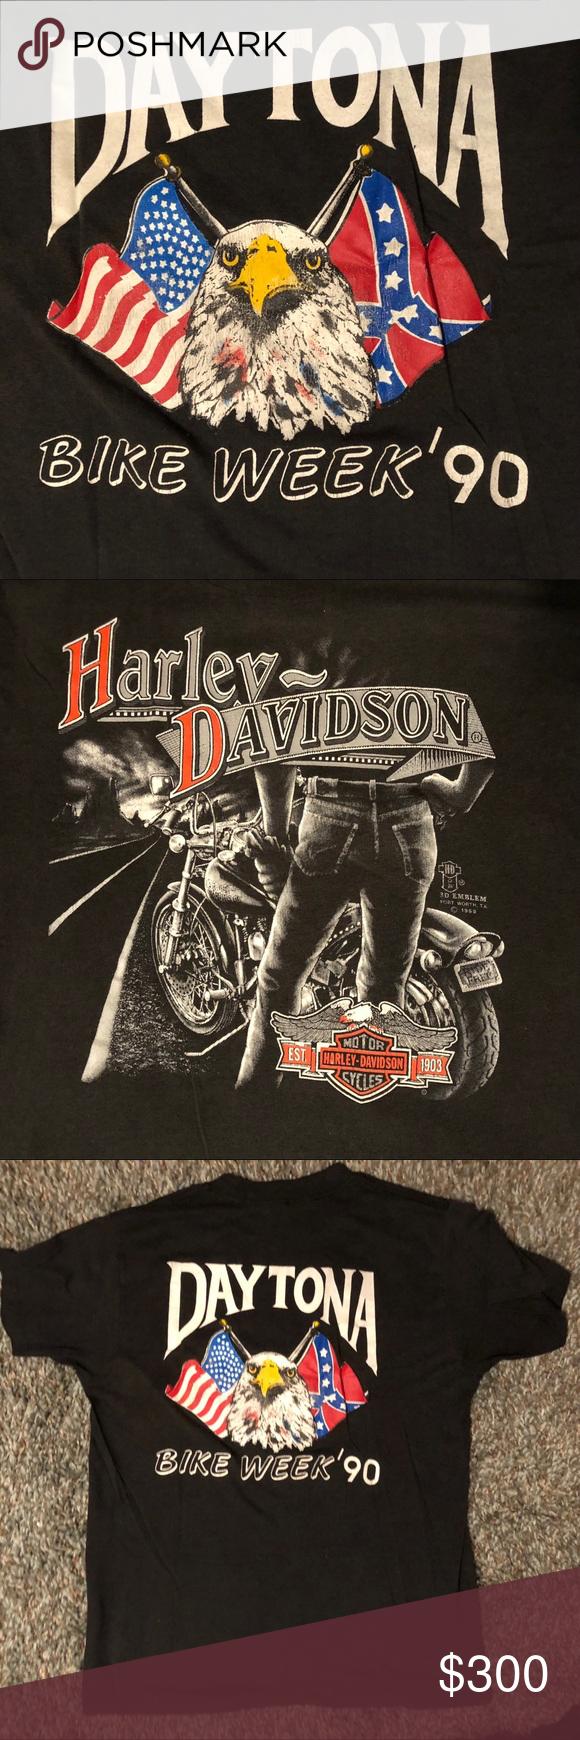 Harley Davidson 3D Emblem Vintage Motorcycle Shirt This is